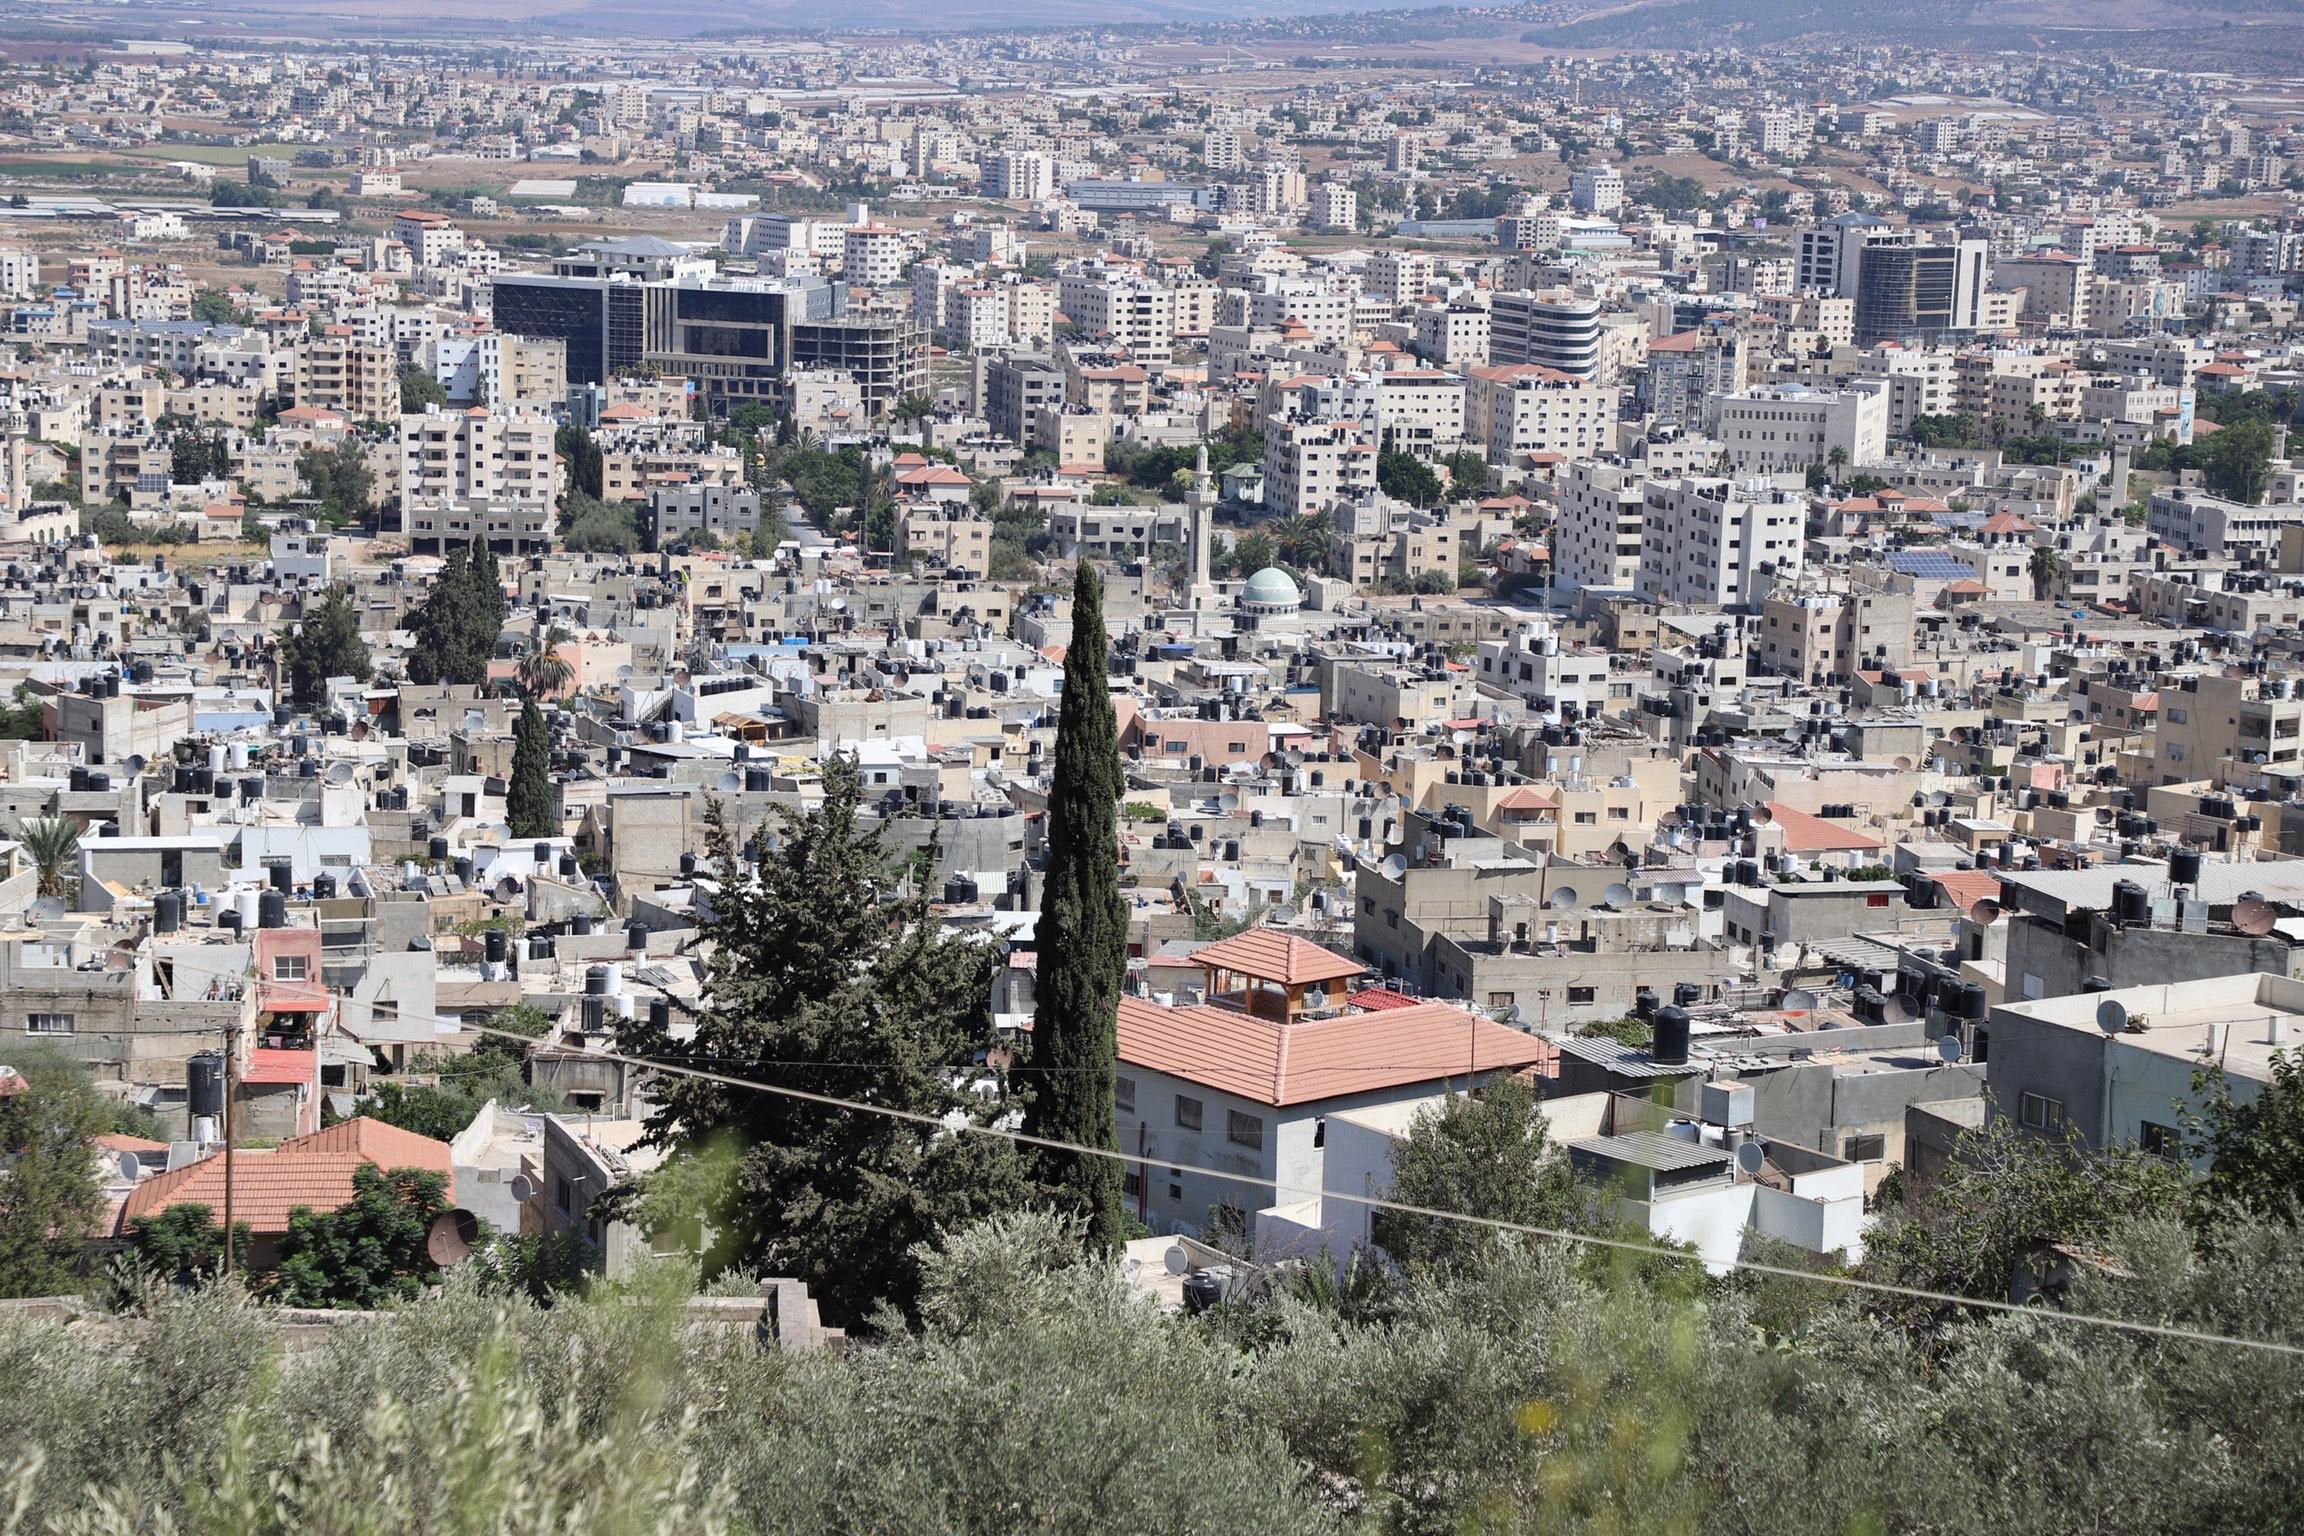 Jenin city and camp